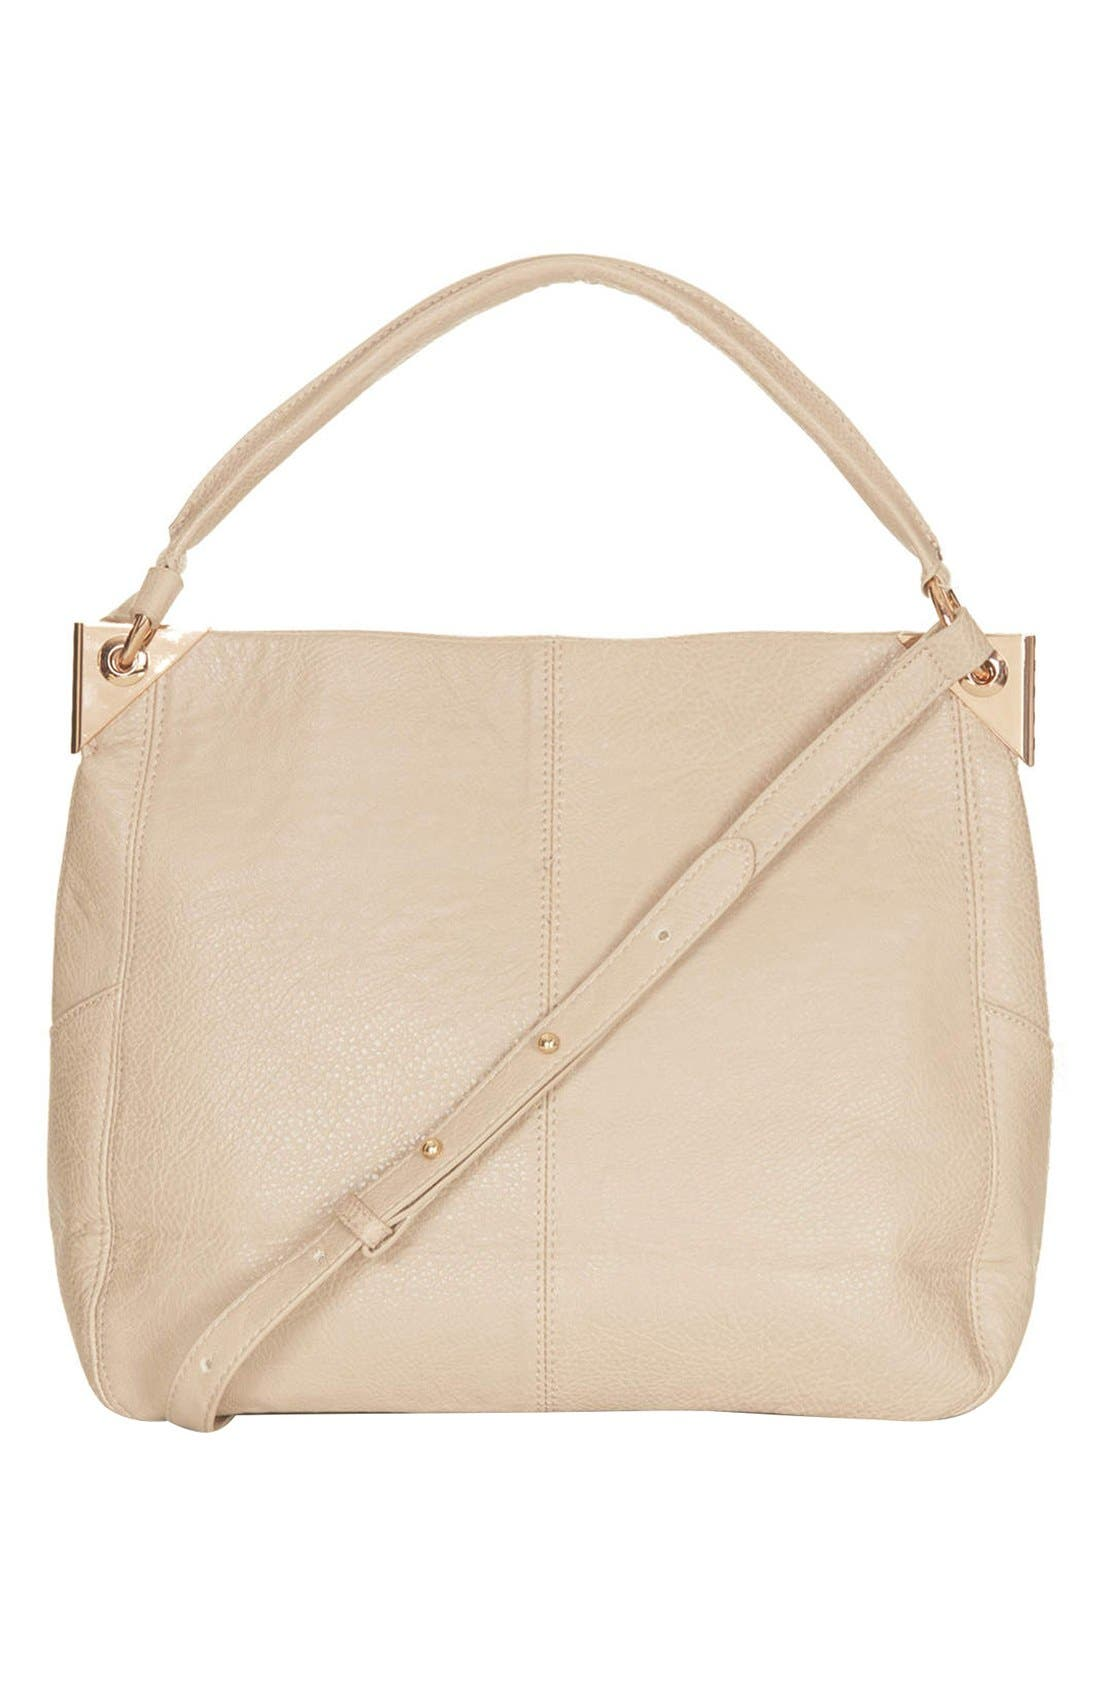 Main Image - Topshop Faux Leather Hobo Bag